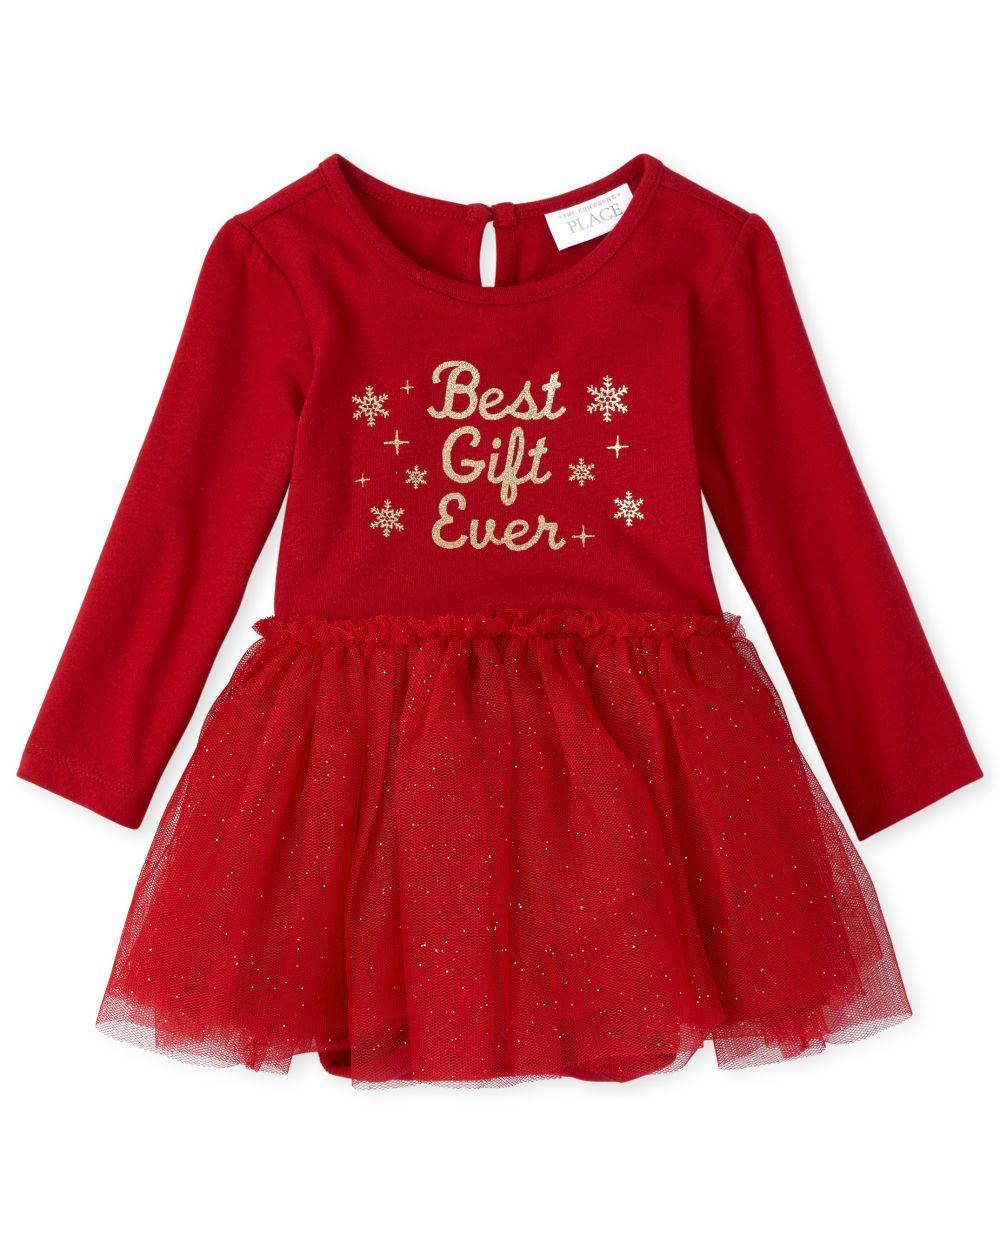 Newborn Baby Glitter Best Gift Knit To Woven Tutu Dress - Red